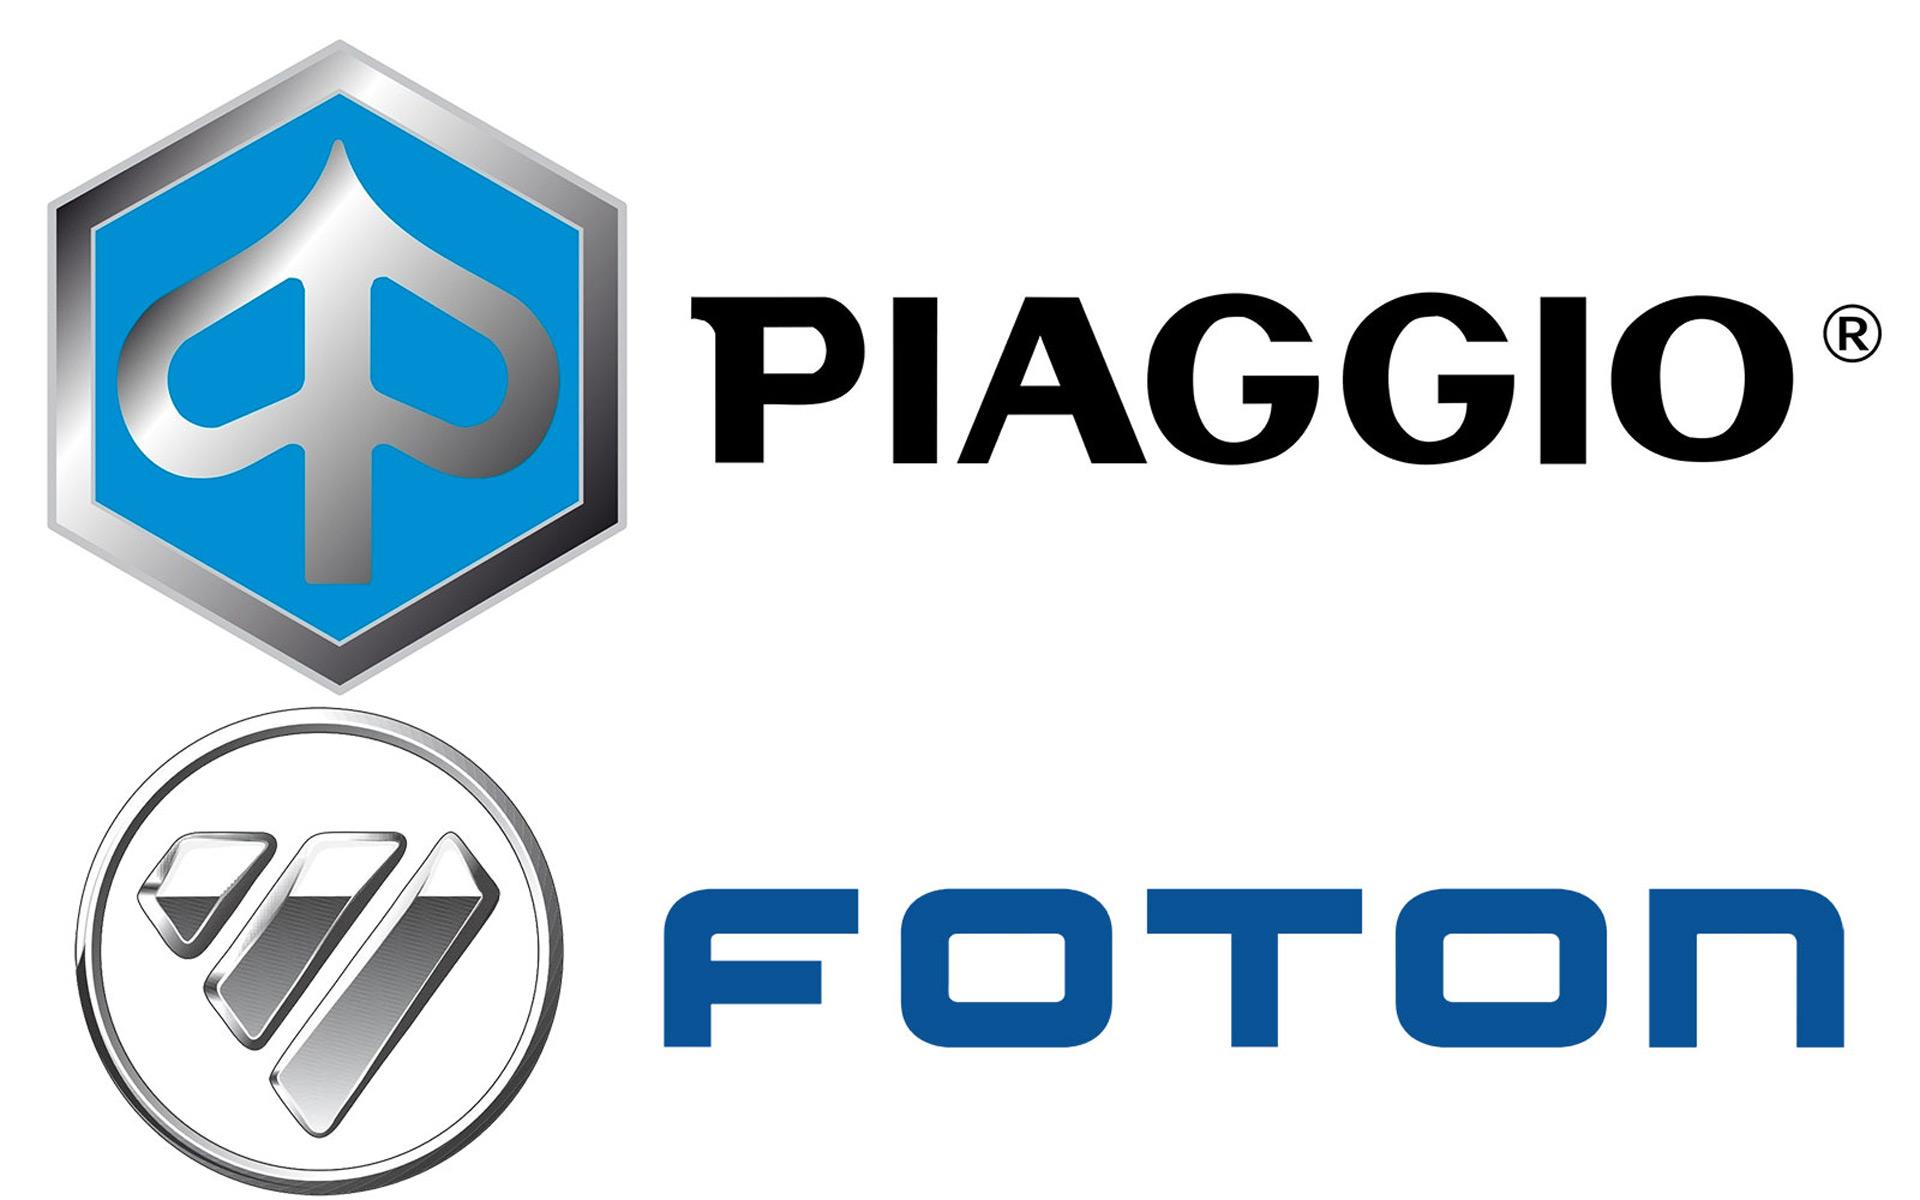 Foton и Piaggio подписали соглашение о сотрудничестве